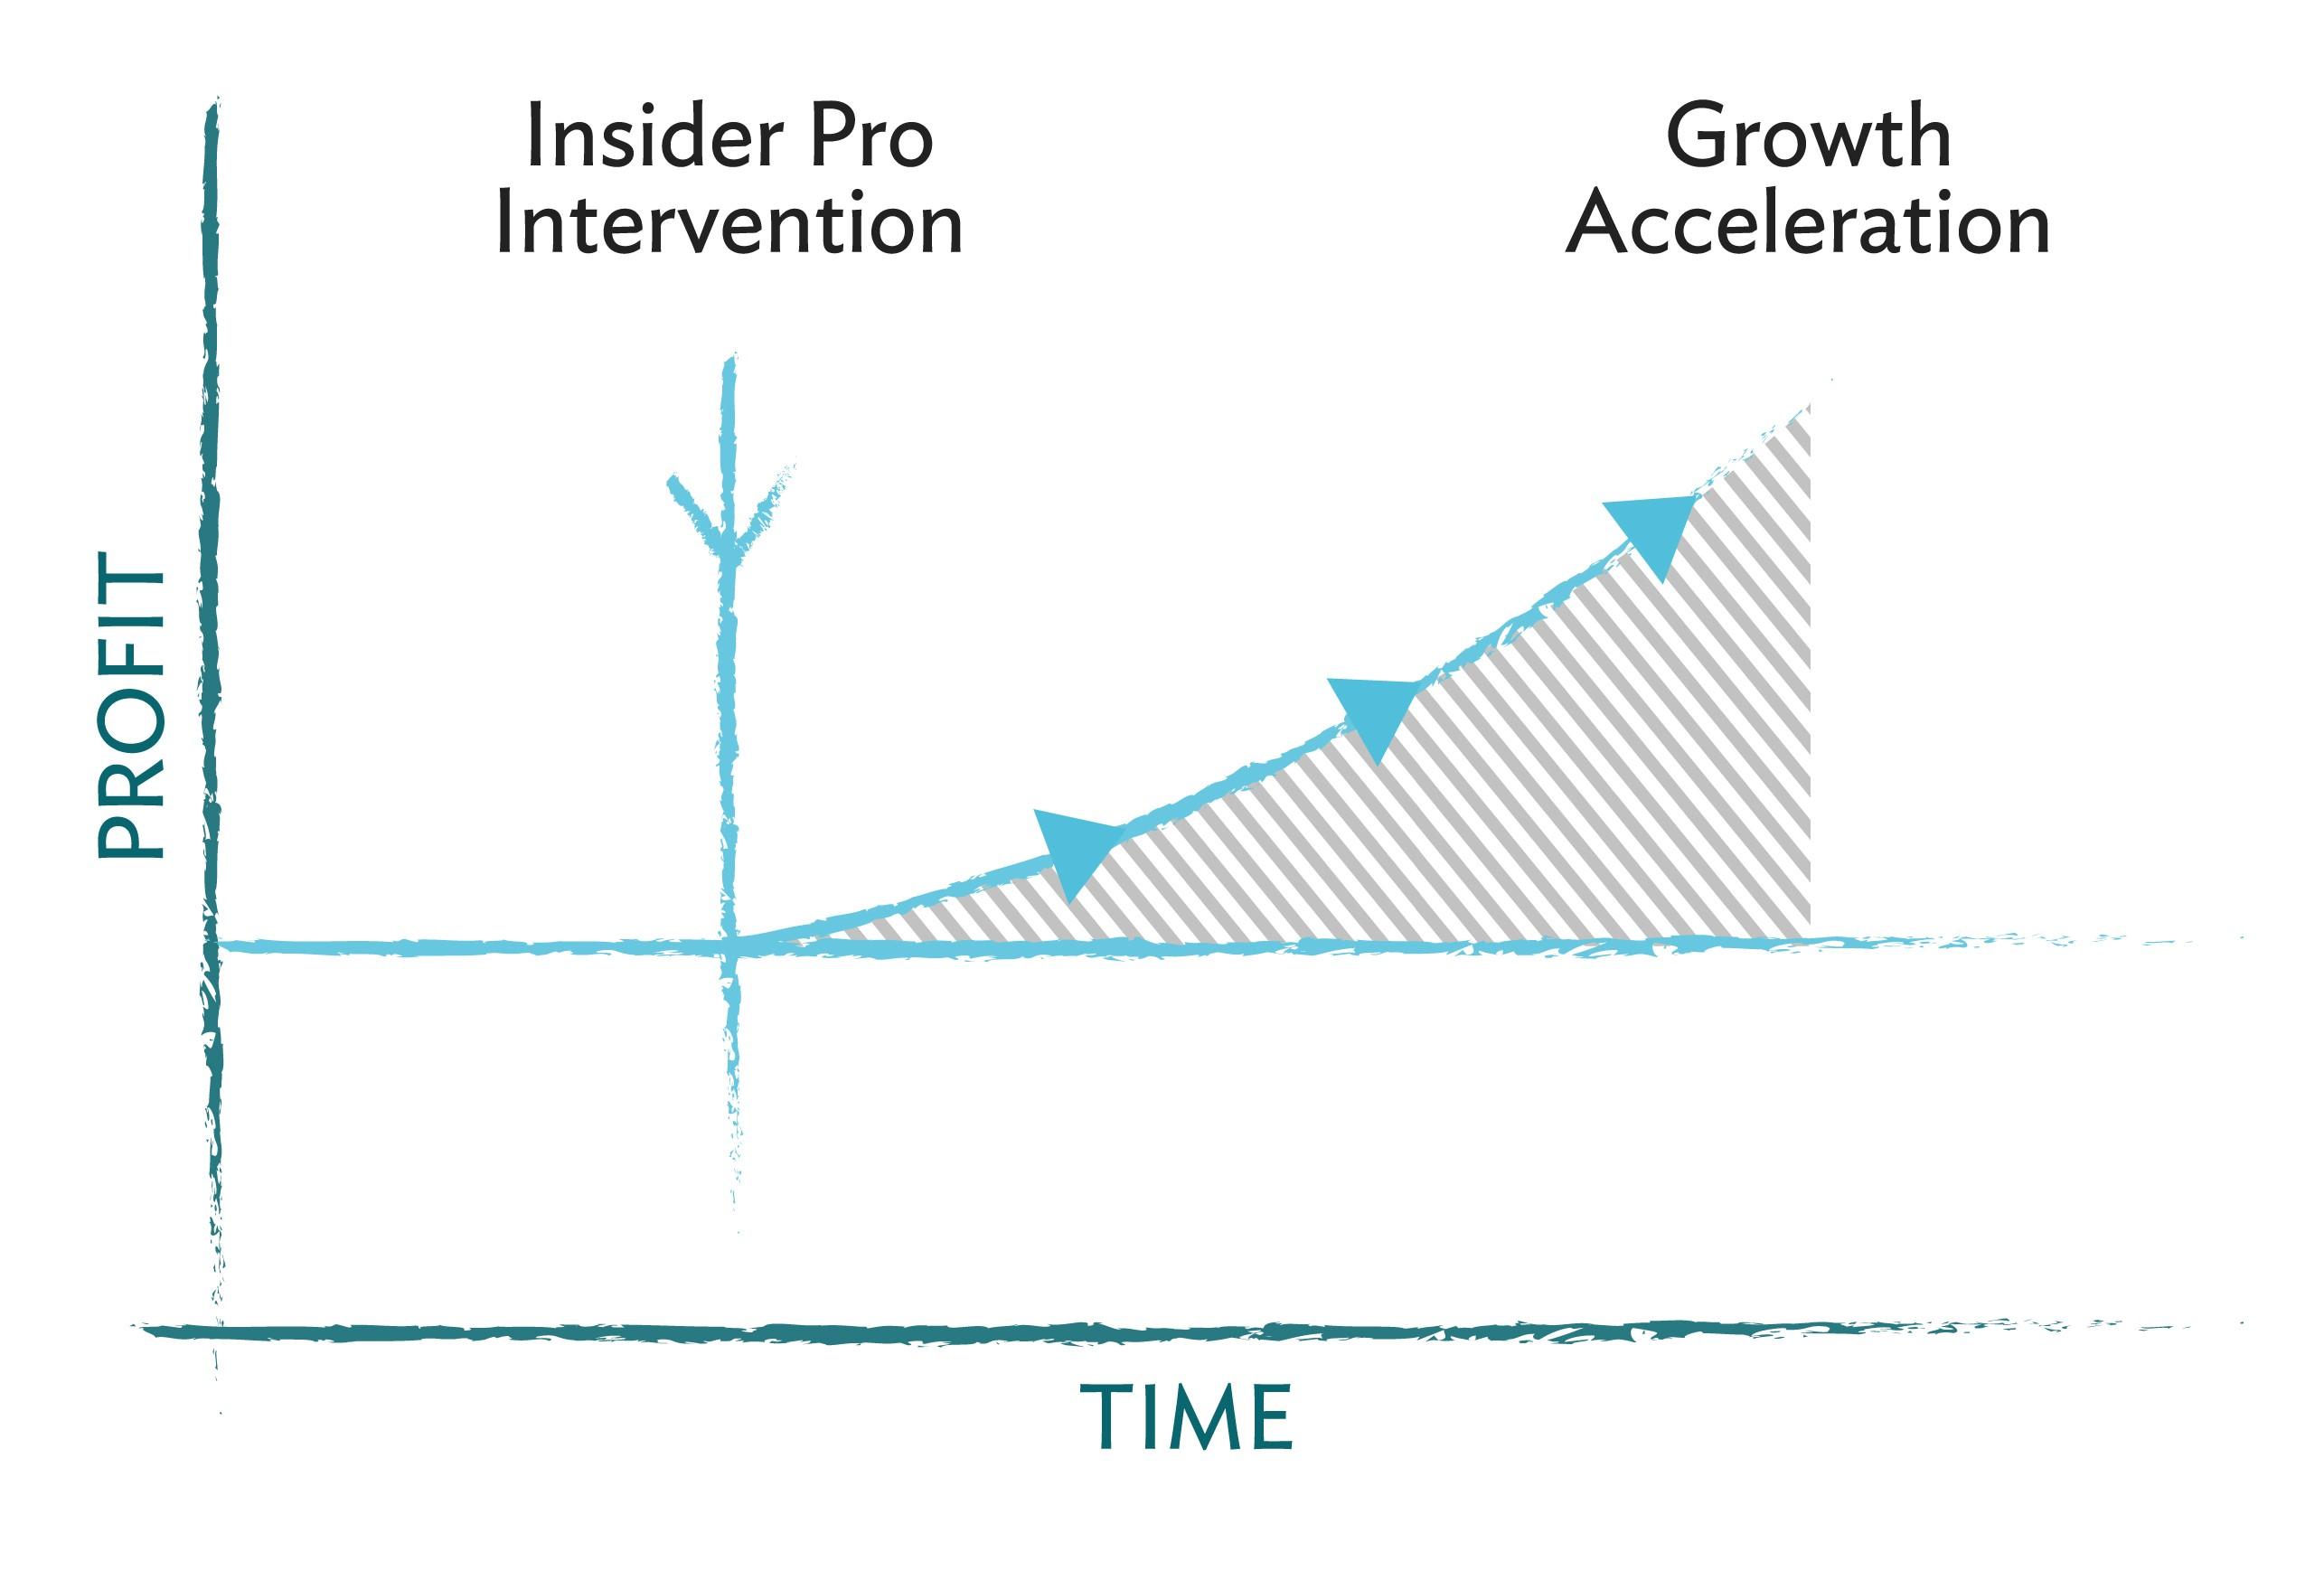 InsiderProInterventionGrowthAccelerationGraph